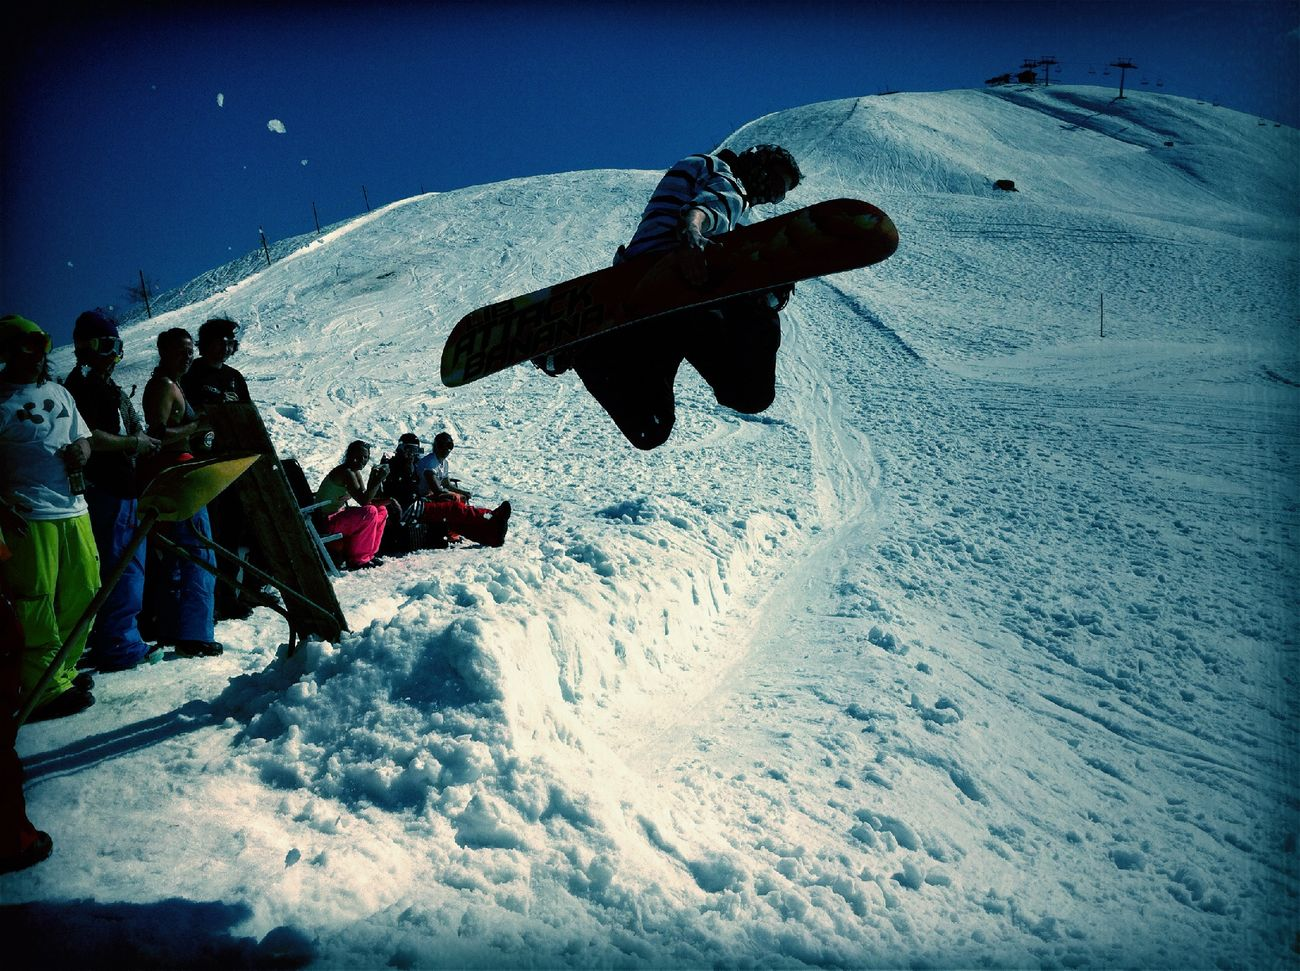 snowboard at Alania Snowboard